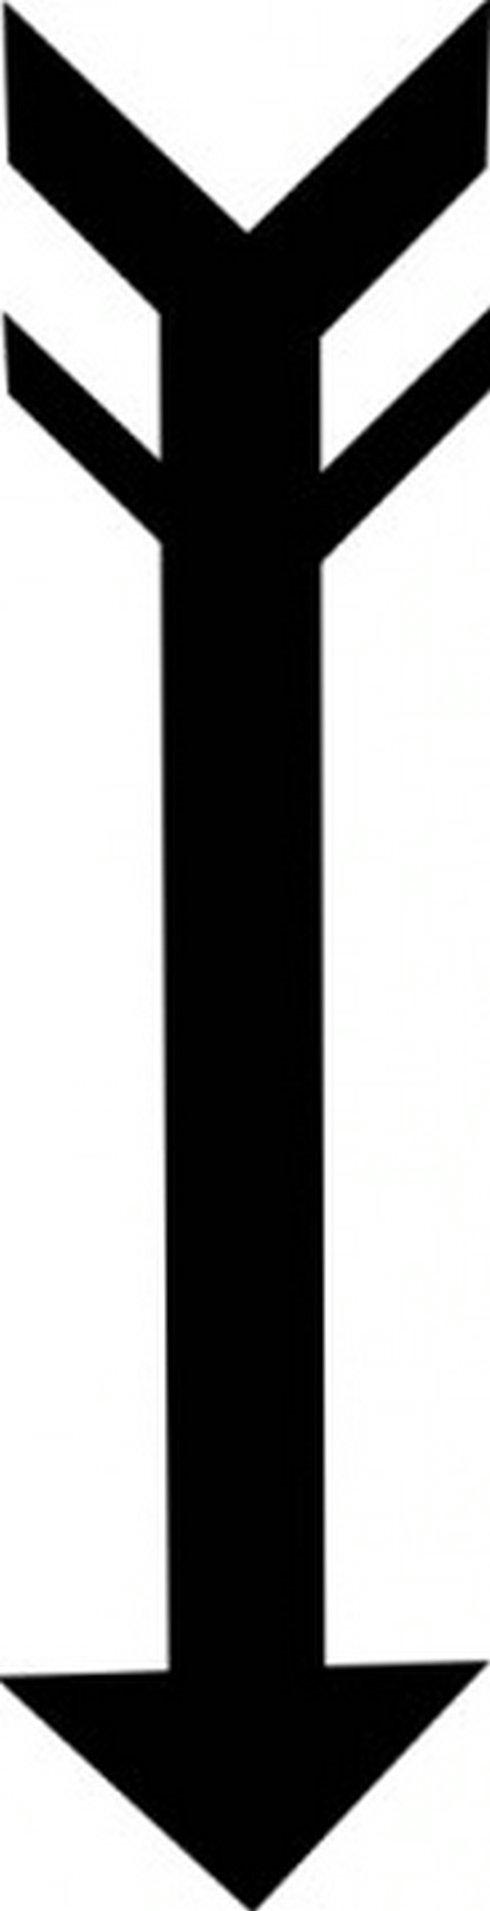 arrow clip art clipart panda free clipart images rh clipartpanda com free arrow clip art to copy free arrow clip art black and white